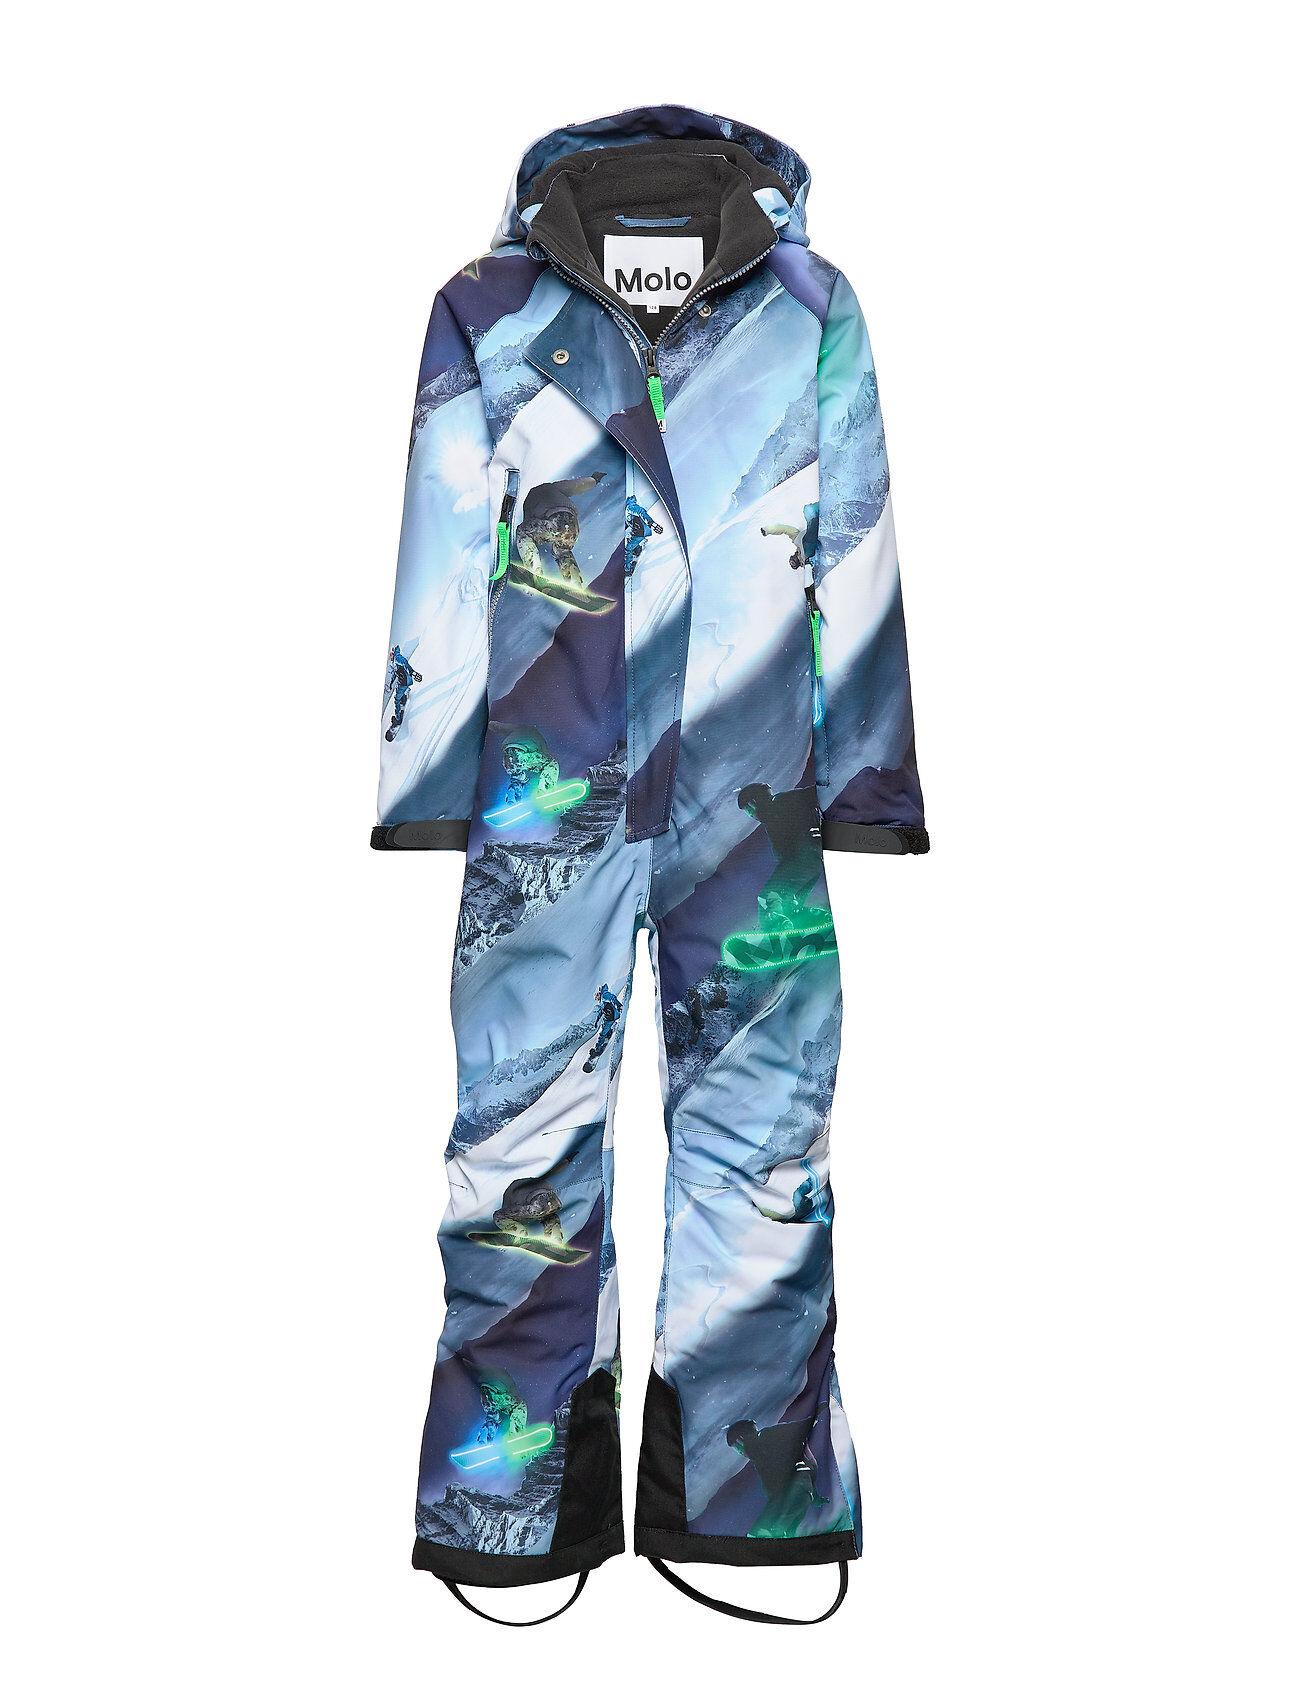 Molo Hux Outerwear Snow/ski Clothing Snow/ski Suits & Sets Sininen Molo